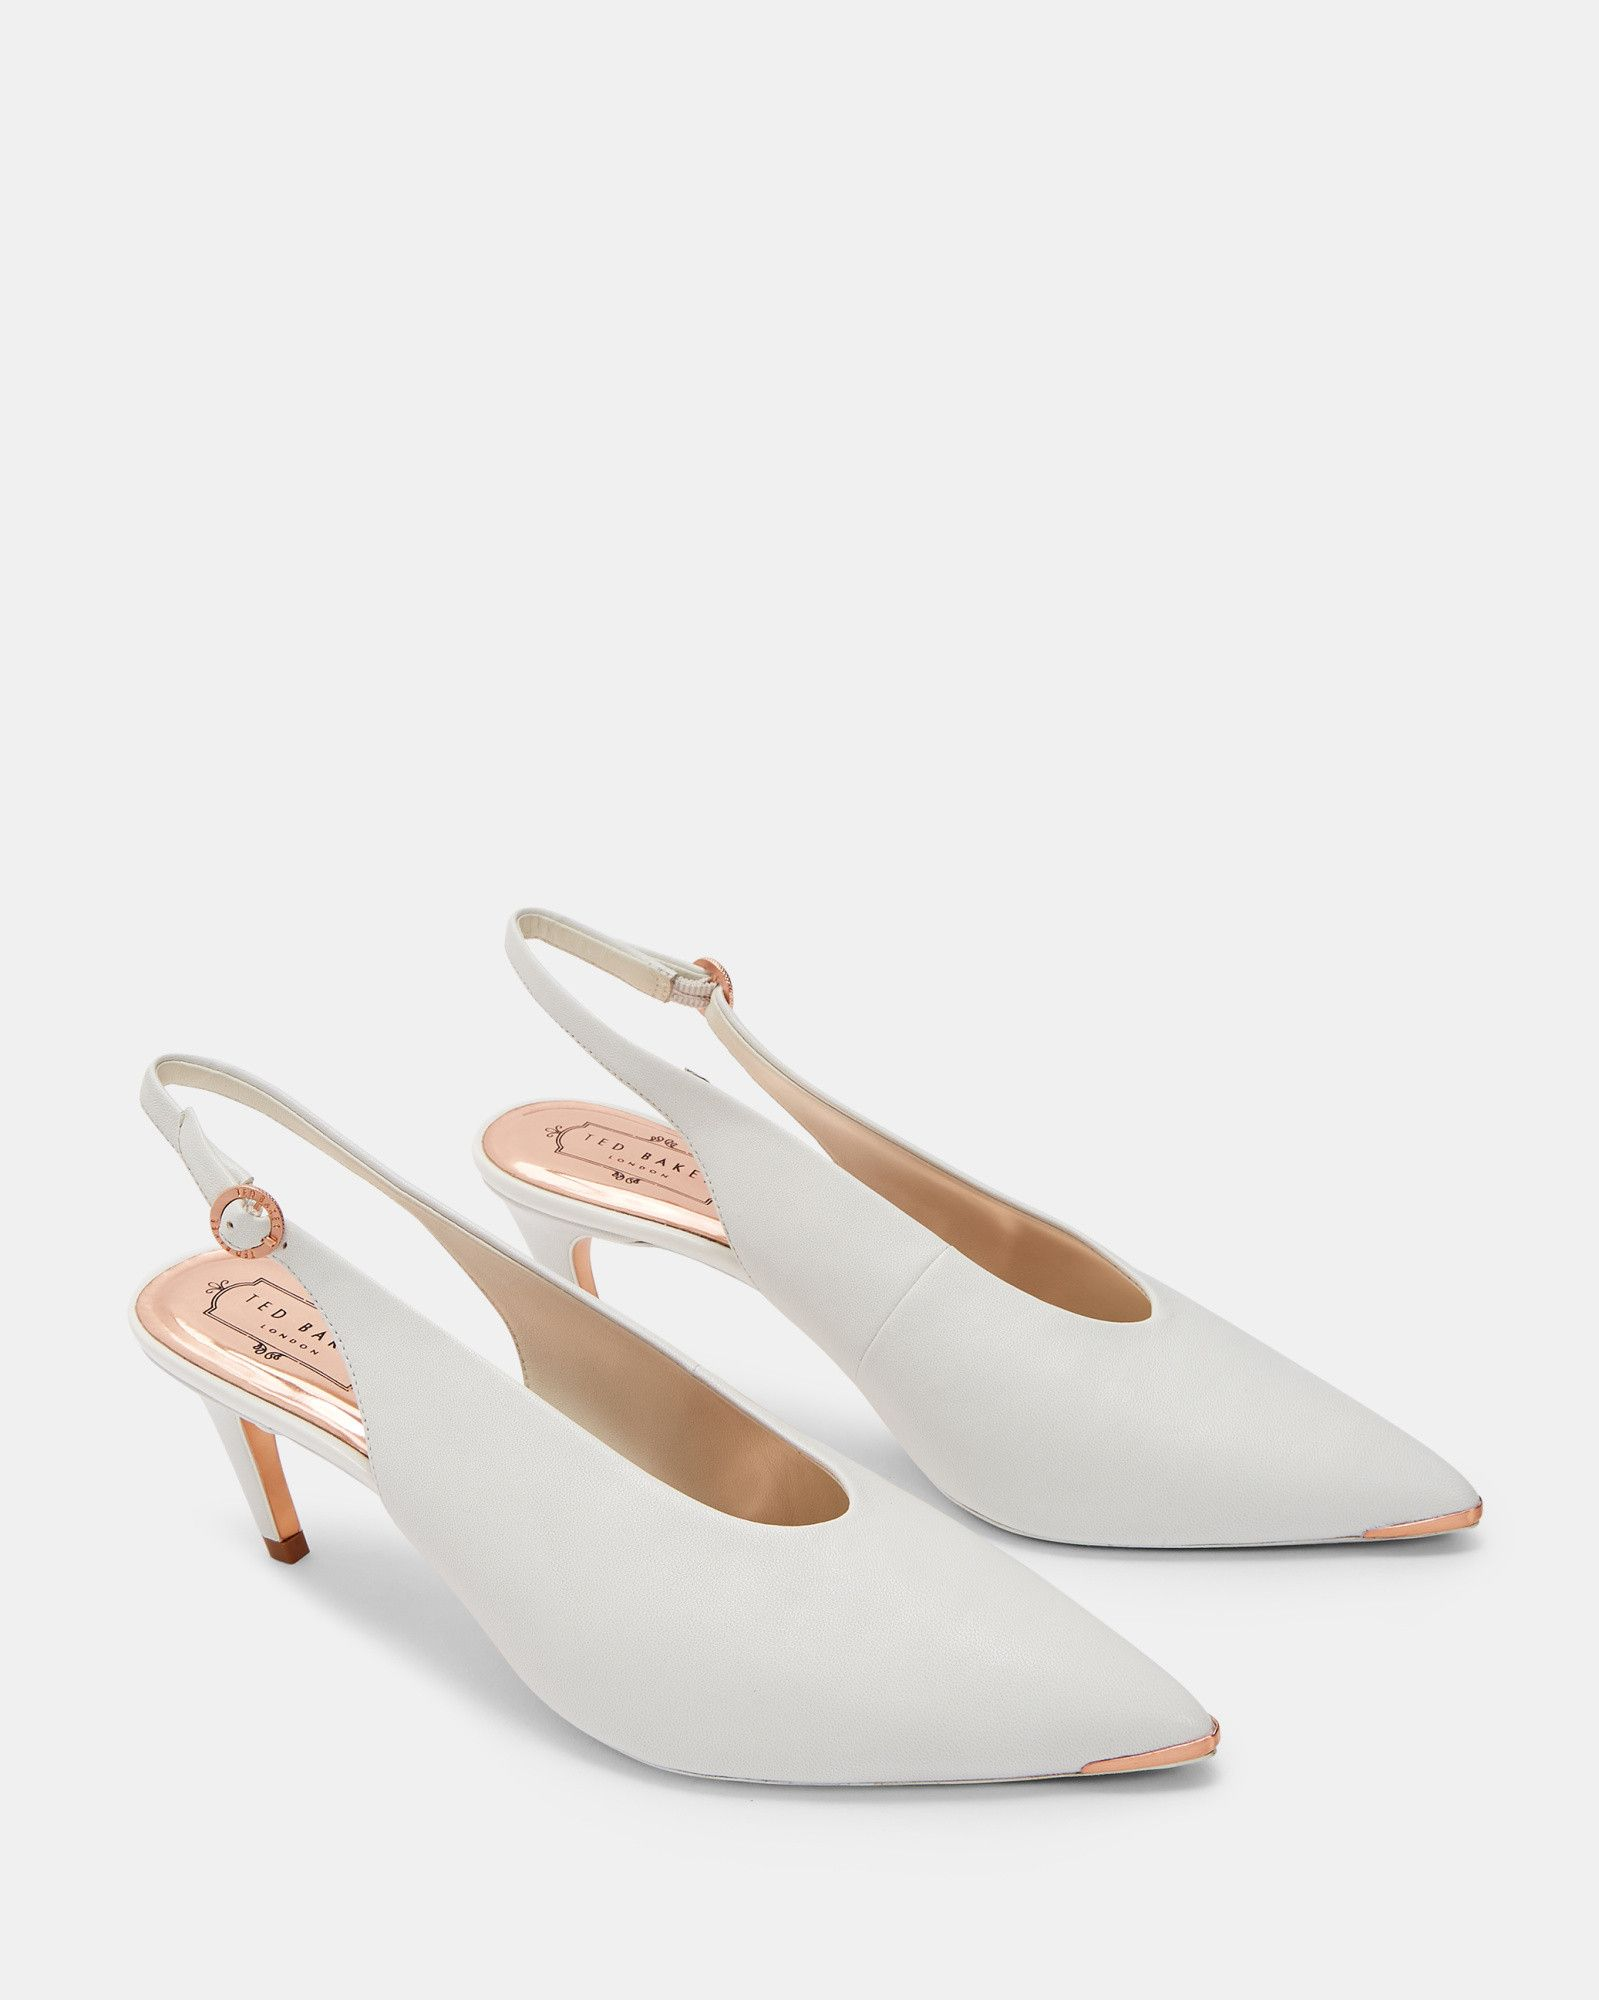 Hulia Slanted Heel Sling Back Courts Tedtotoe Heels Footwear Design Women Women Accessories Shoes